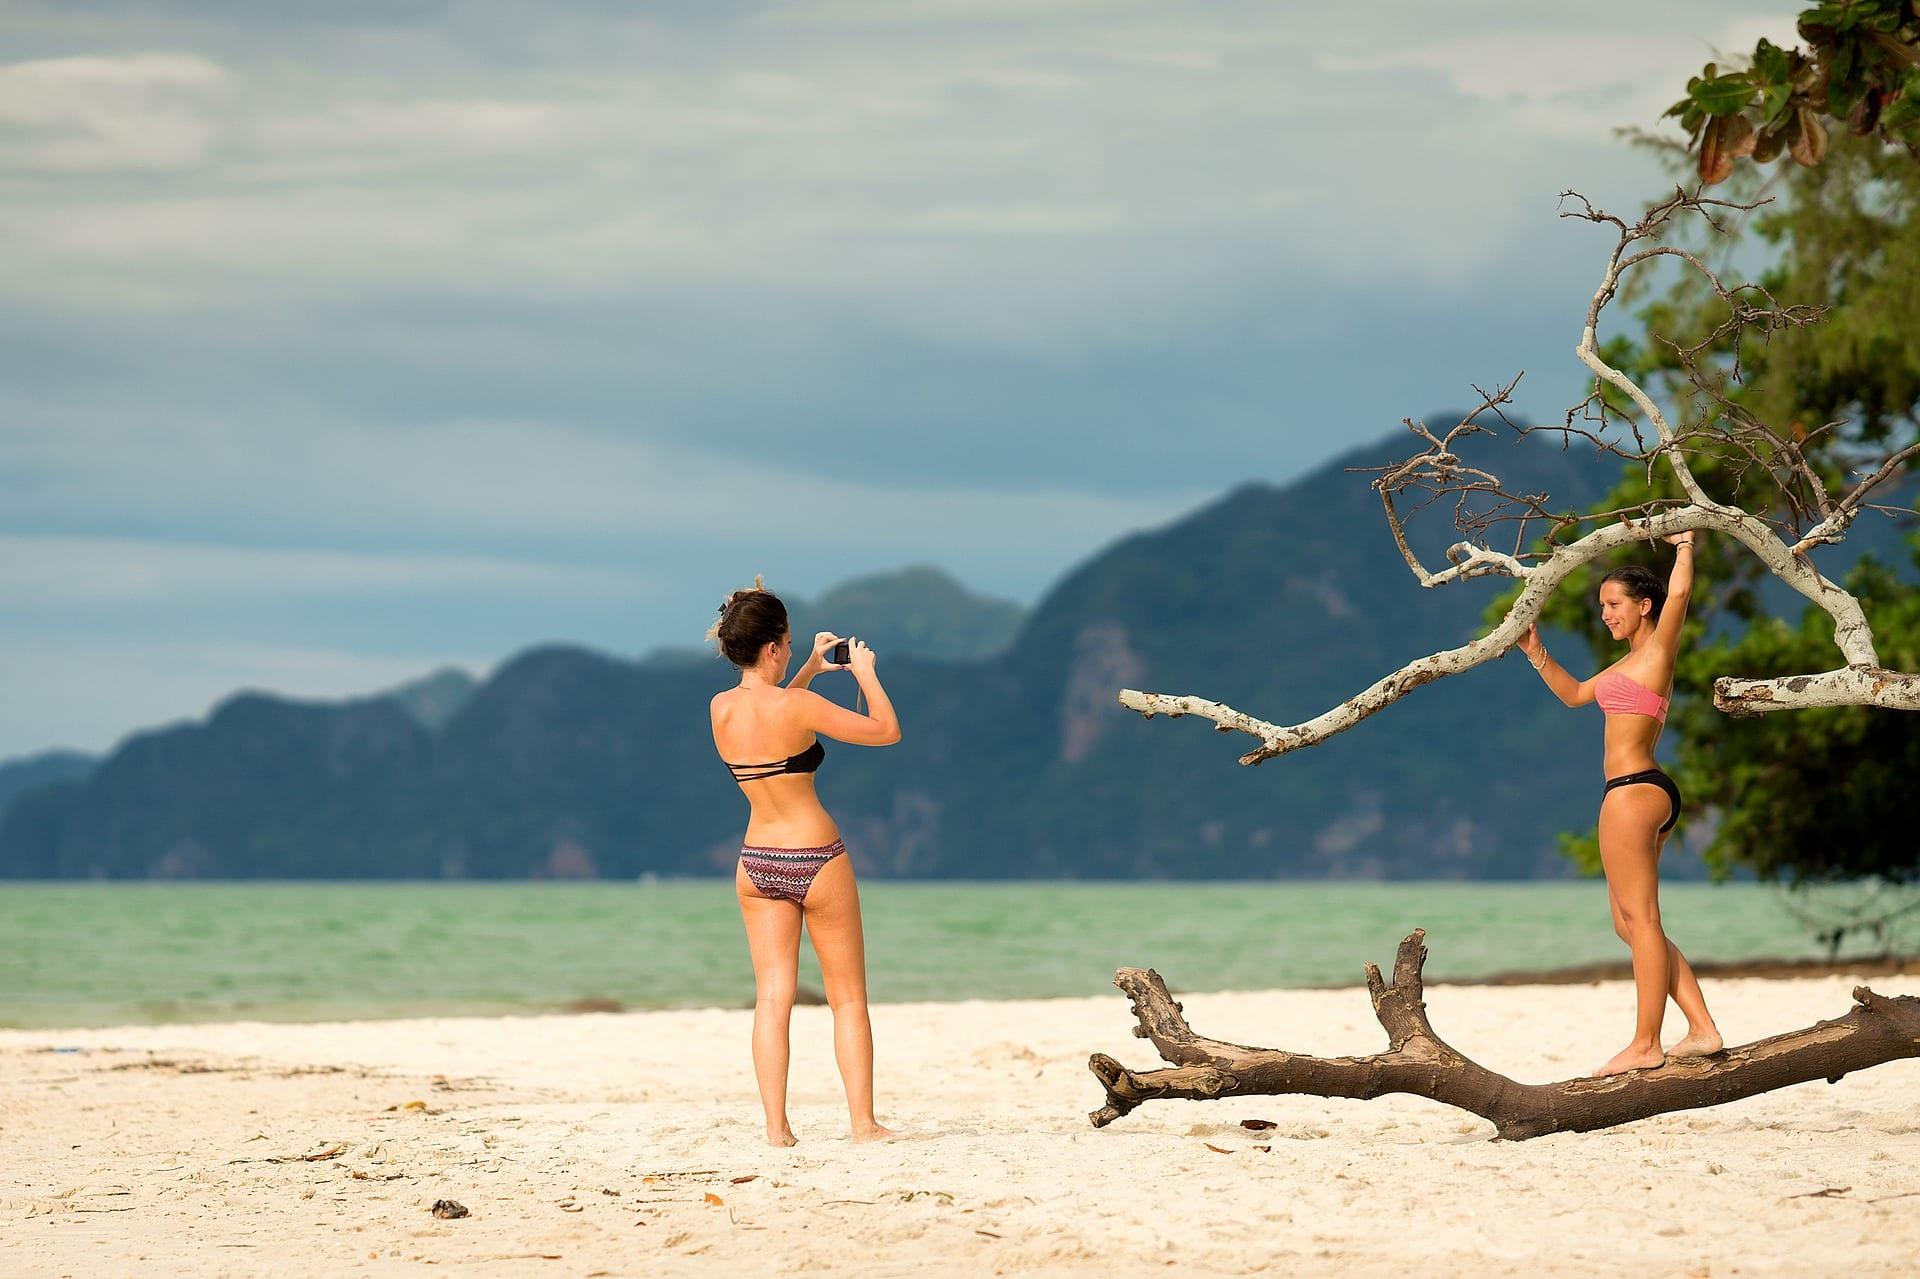 100 Beach Captions for Your Spring Break Instagram Posts